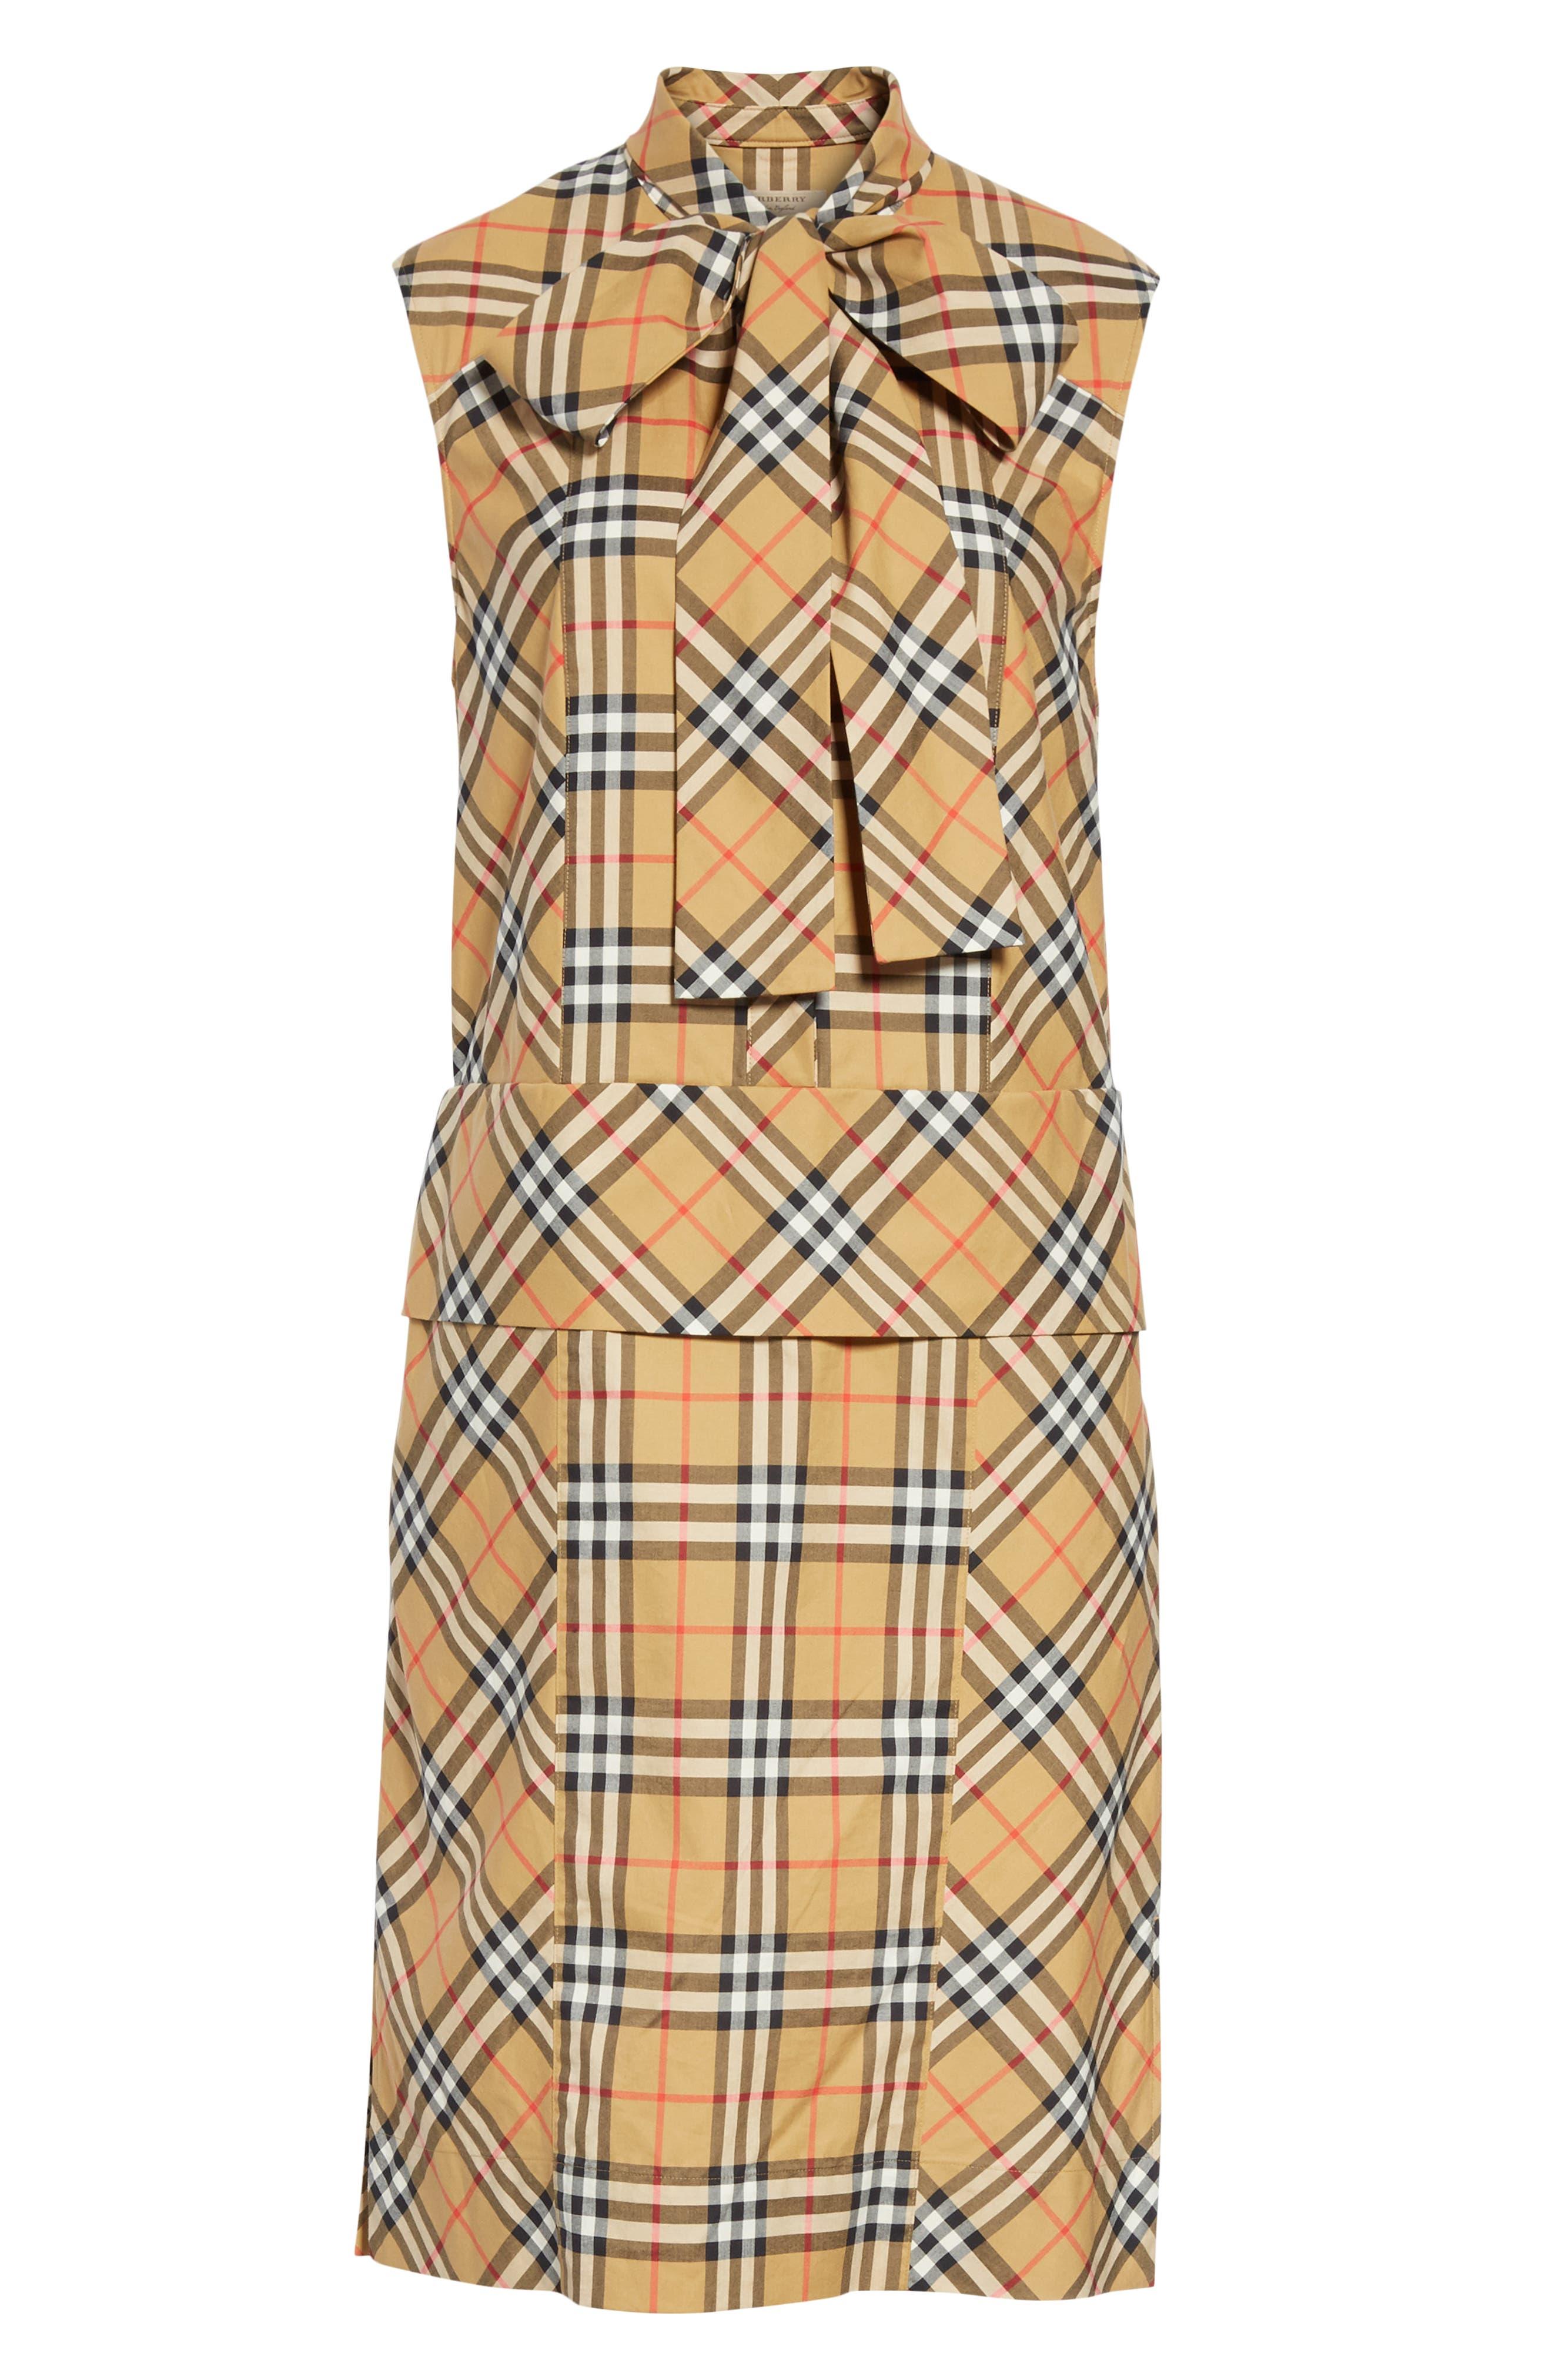 BURBERRY, Luna Tie Neck Check Dress, Alternate thumbnail 7, color, ANTIQUE YELLOW CHECK